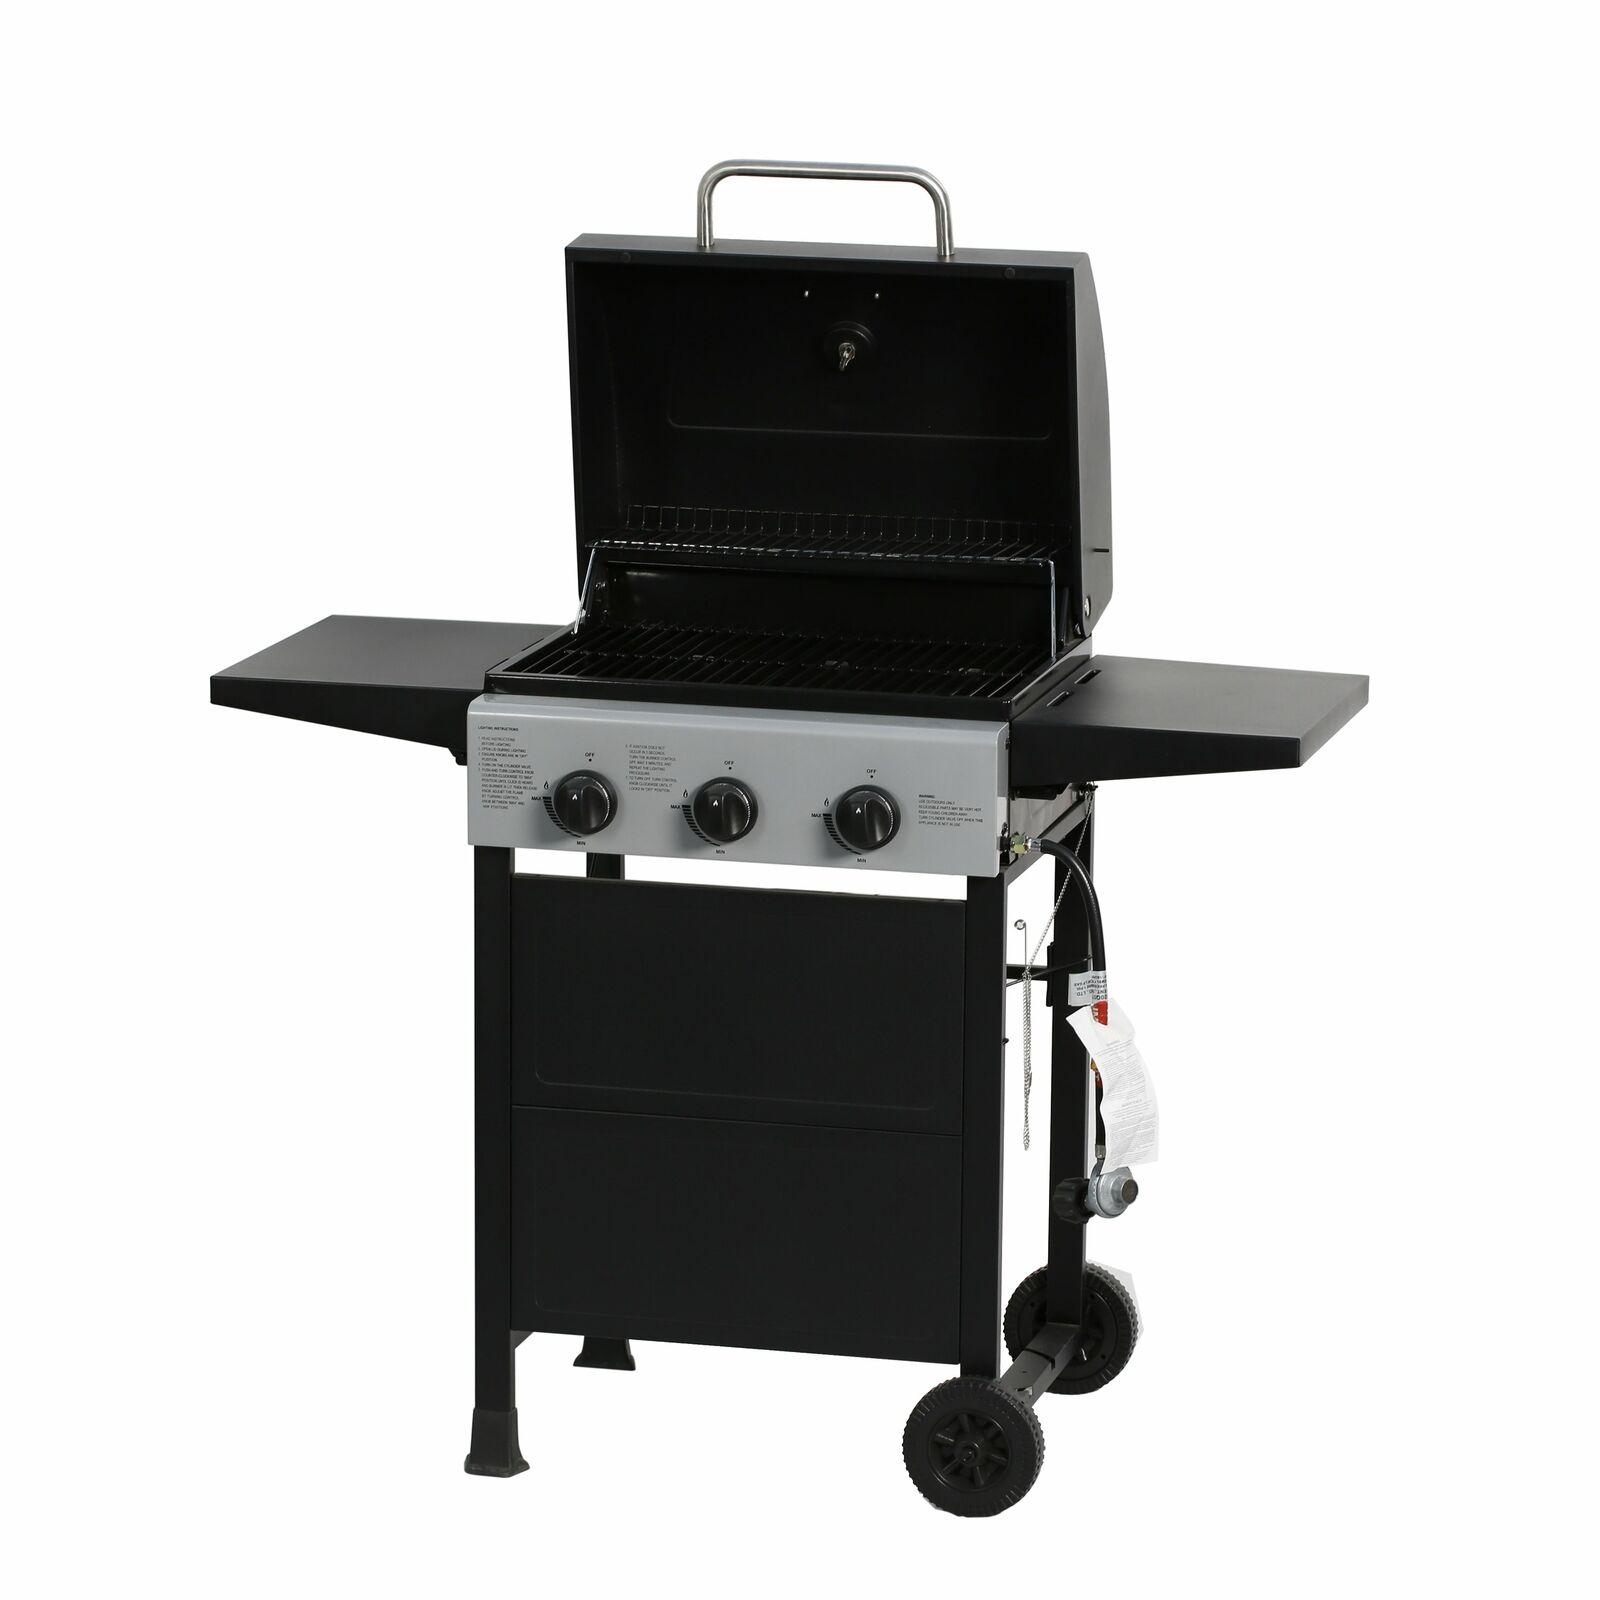 3 Burner Gas Grill  BBQ Garden Patio Stainless Steel Outdoor